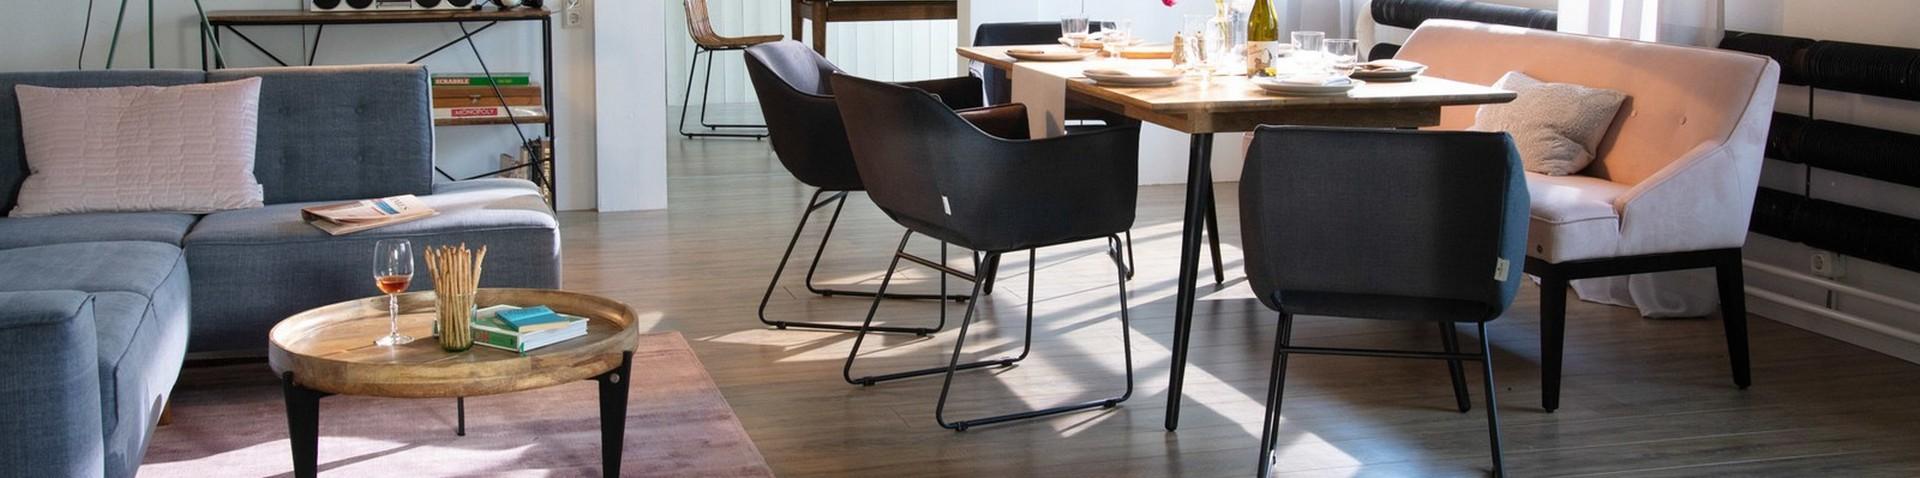 Tom-Tailor-Wohnraum-Sofa-Tischgruppe